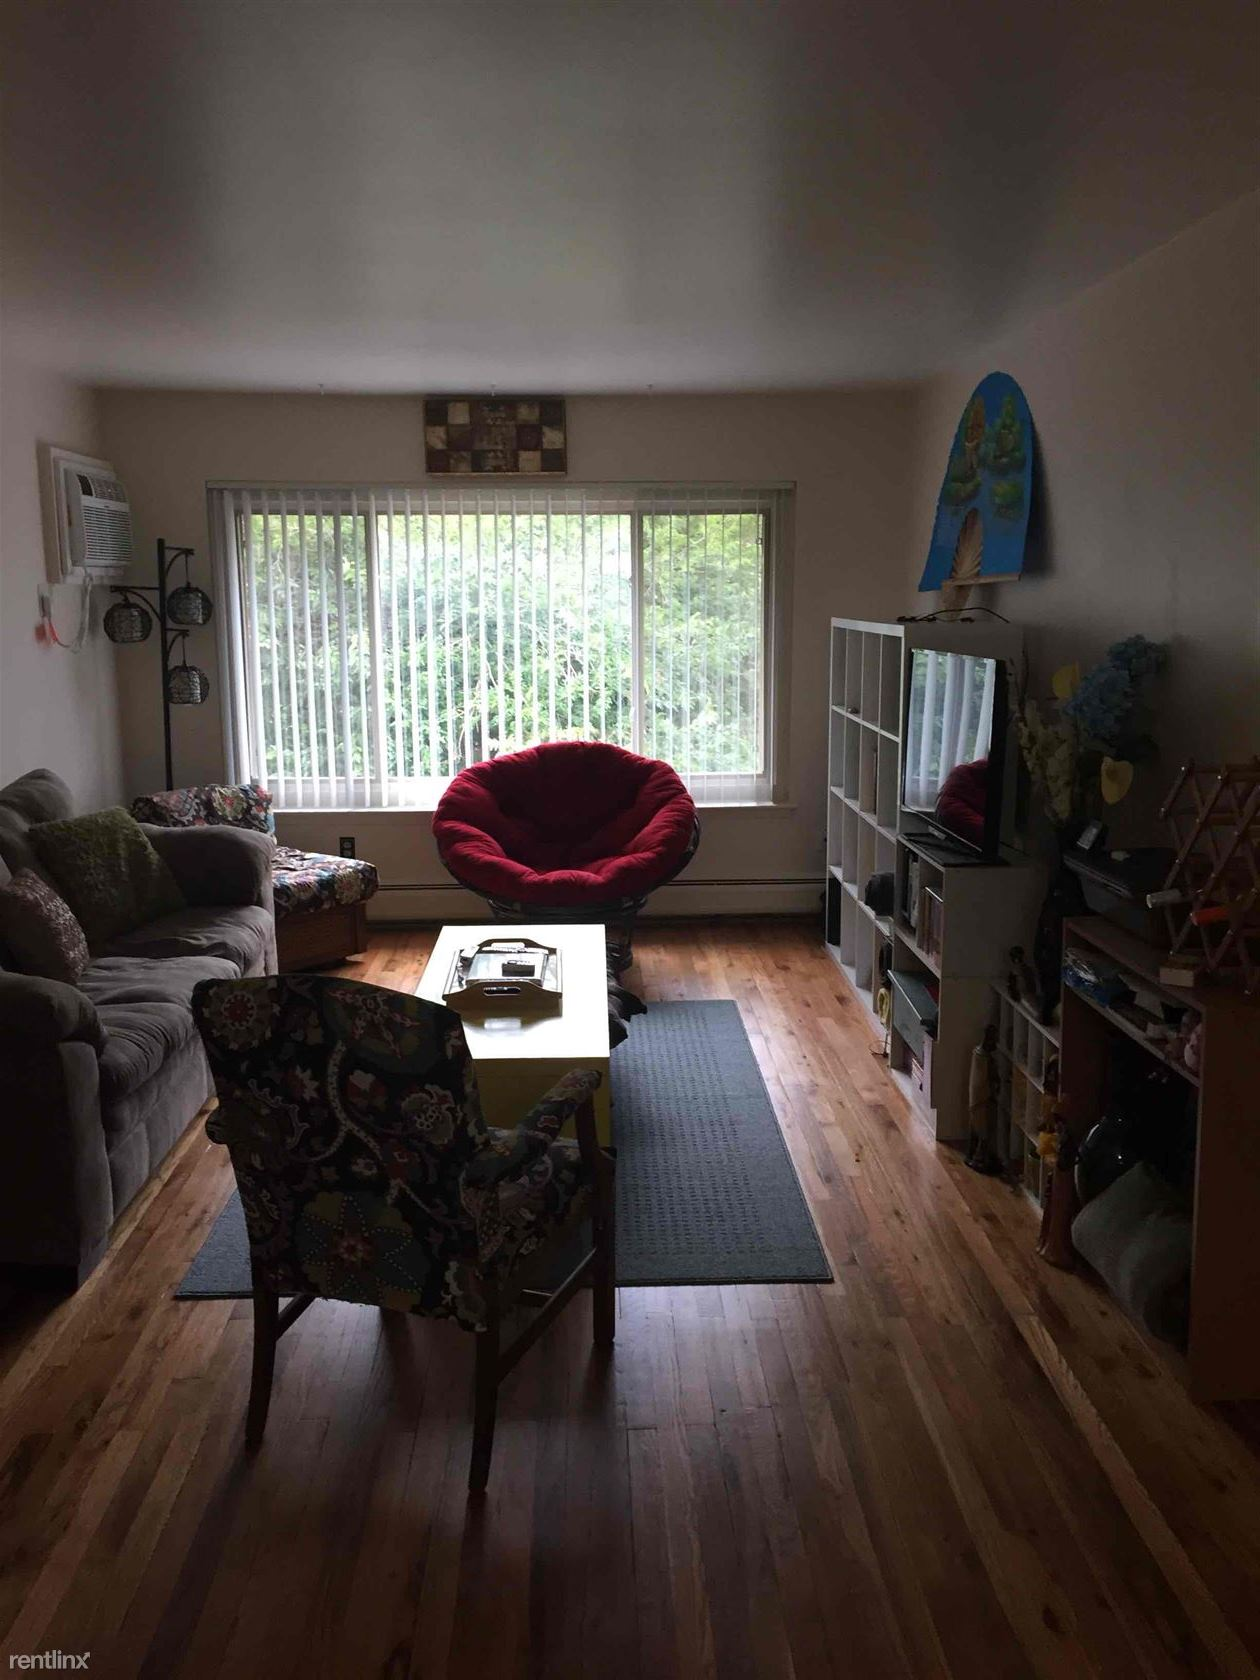 Upgraded 697 sq ft 1 br, hardwood floors